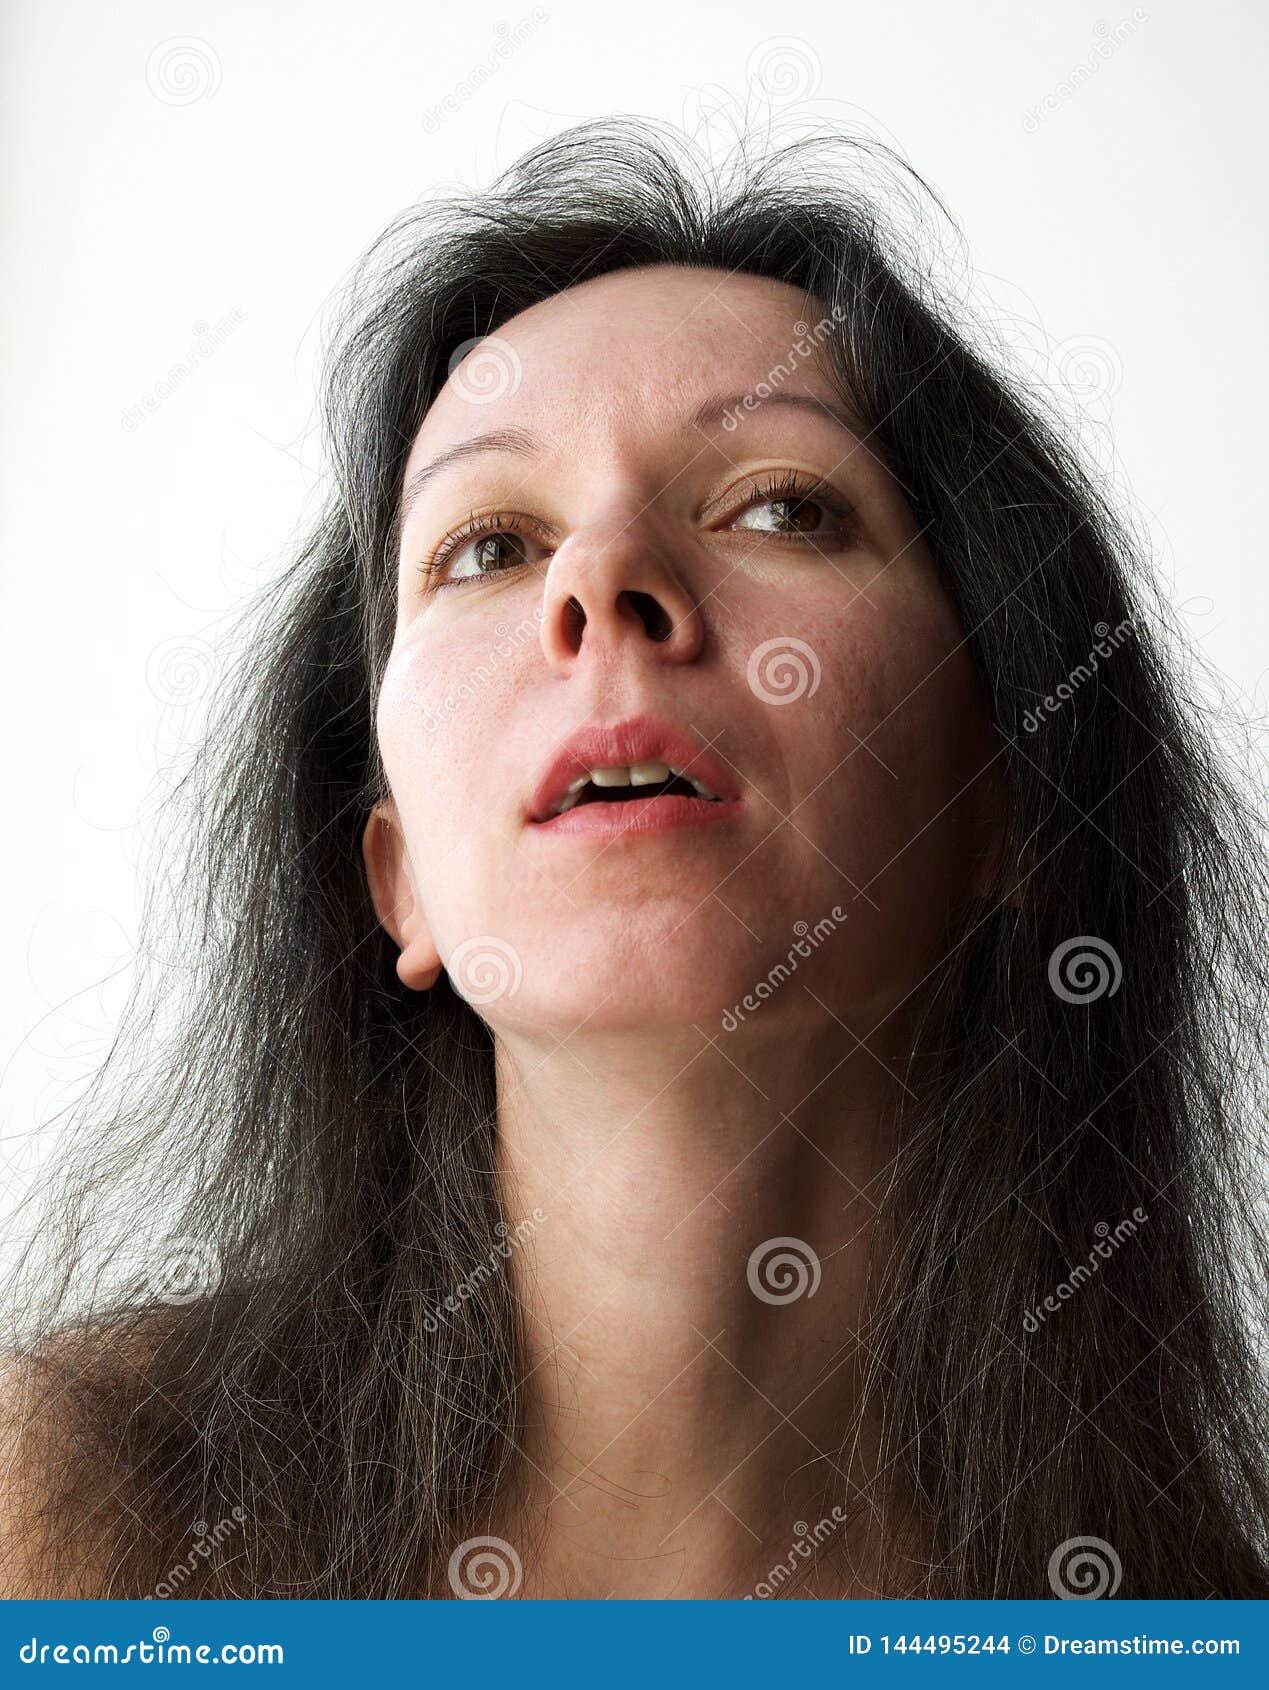 Portrait of a pretty dreamy young woman